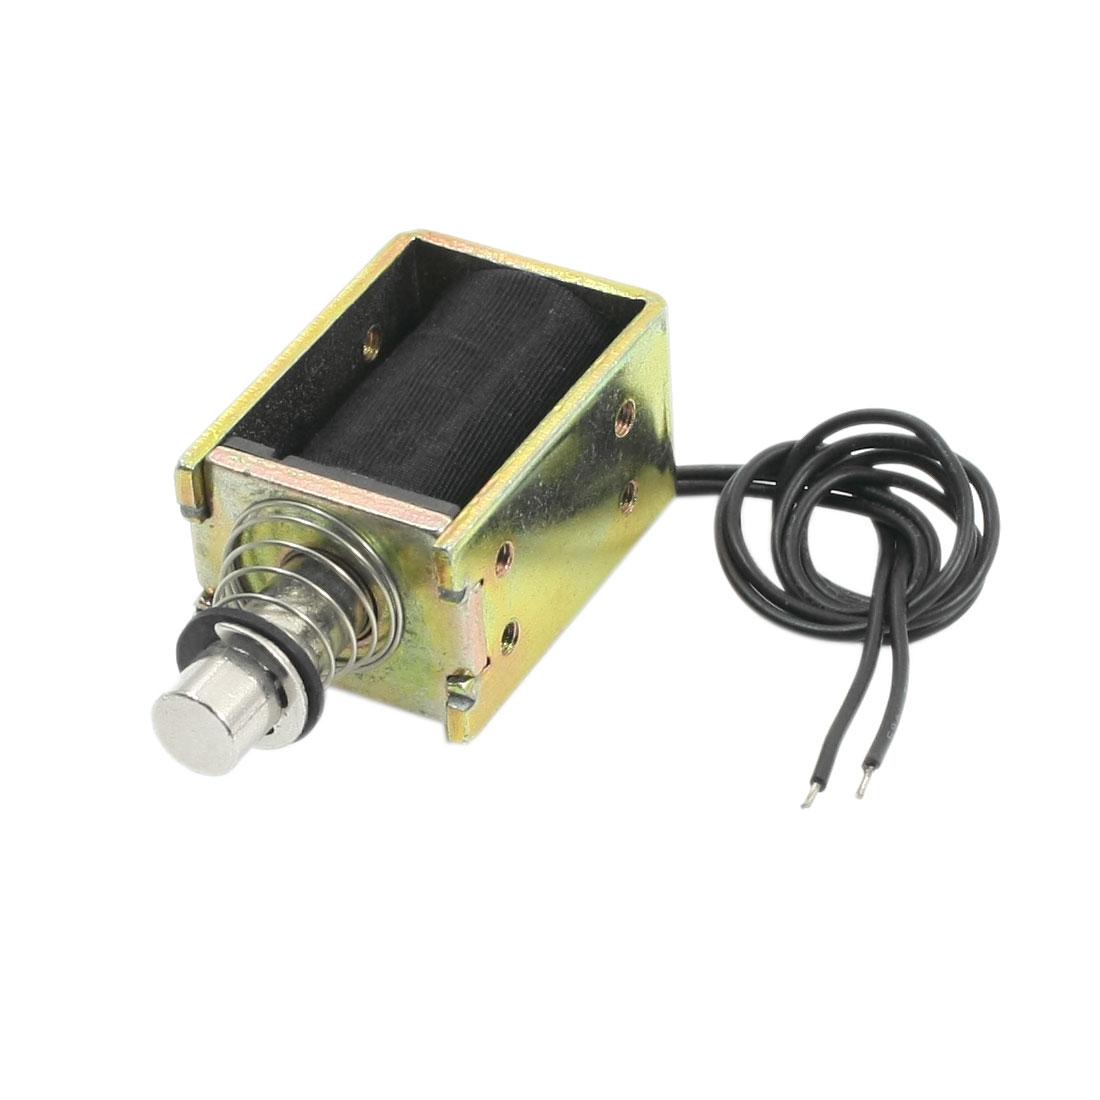 DC60V 0.53A 32.1W Pull Push 600g/8mm Open Frame Solenoid Electromagnet